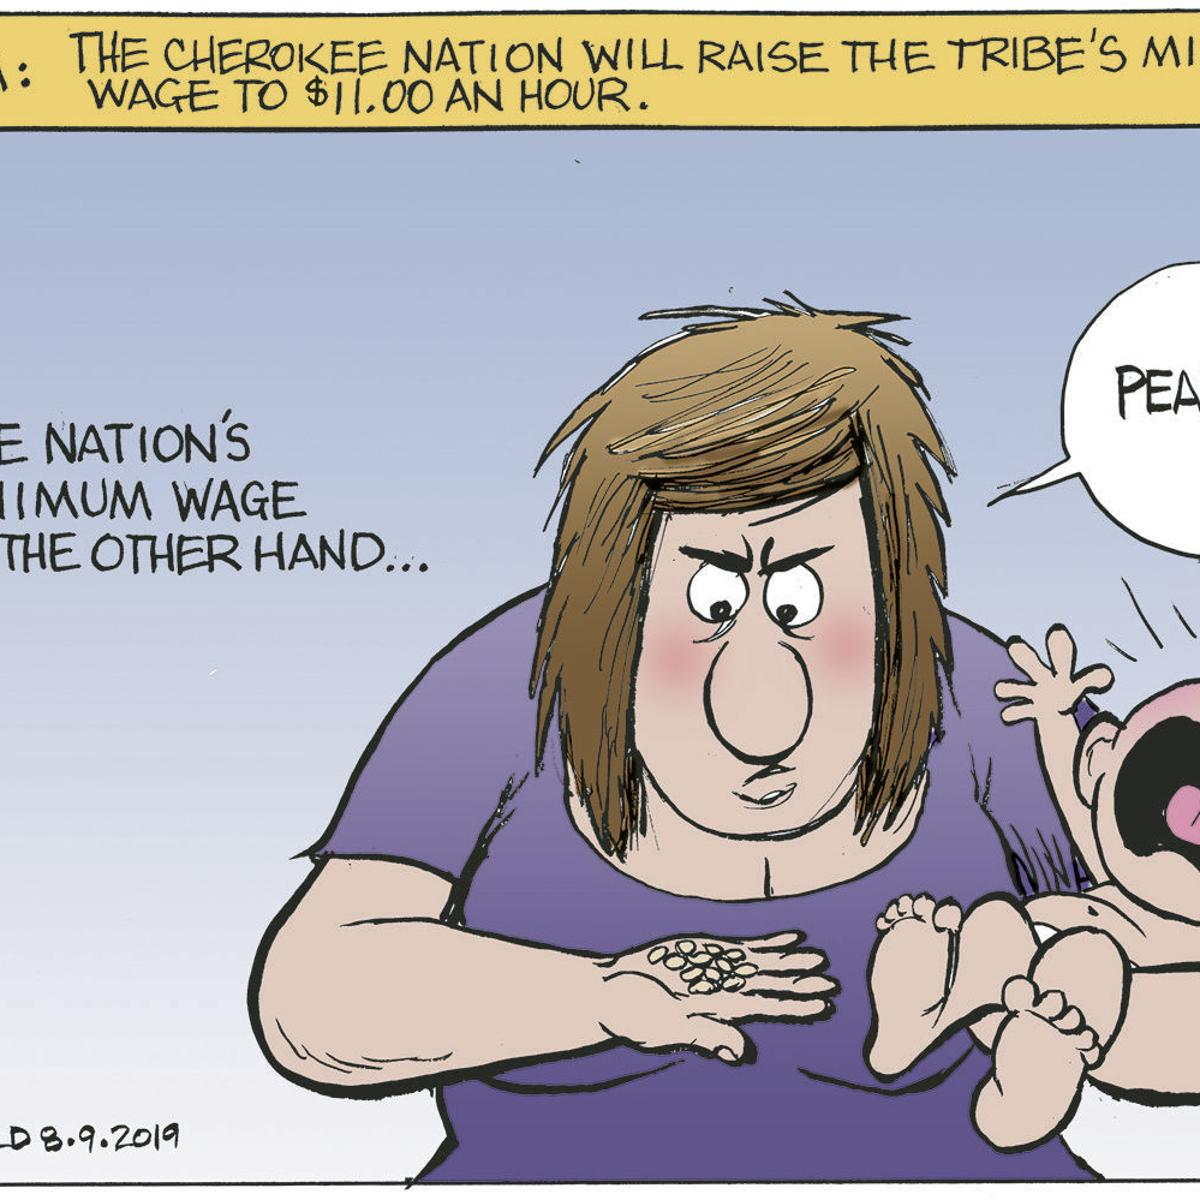 Bruce Plante Cartoon: Cherokee Nation raises minimum wage